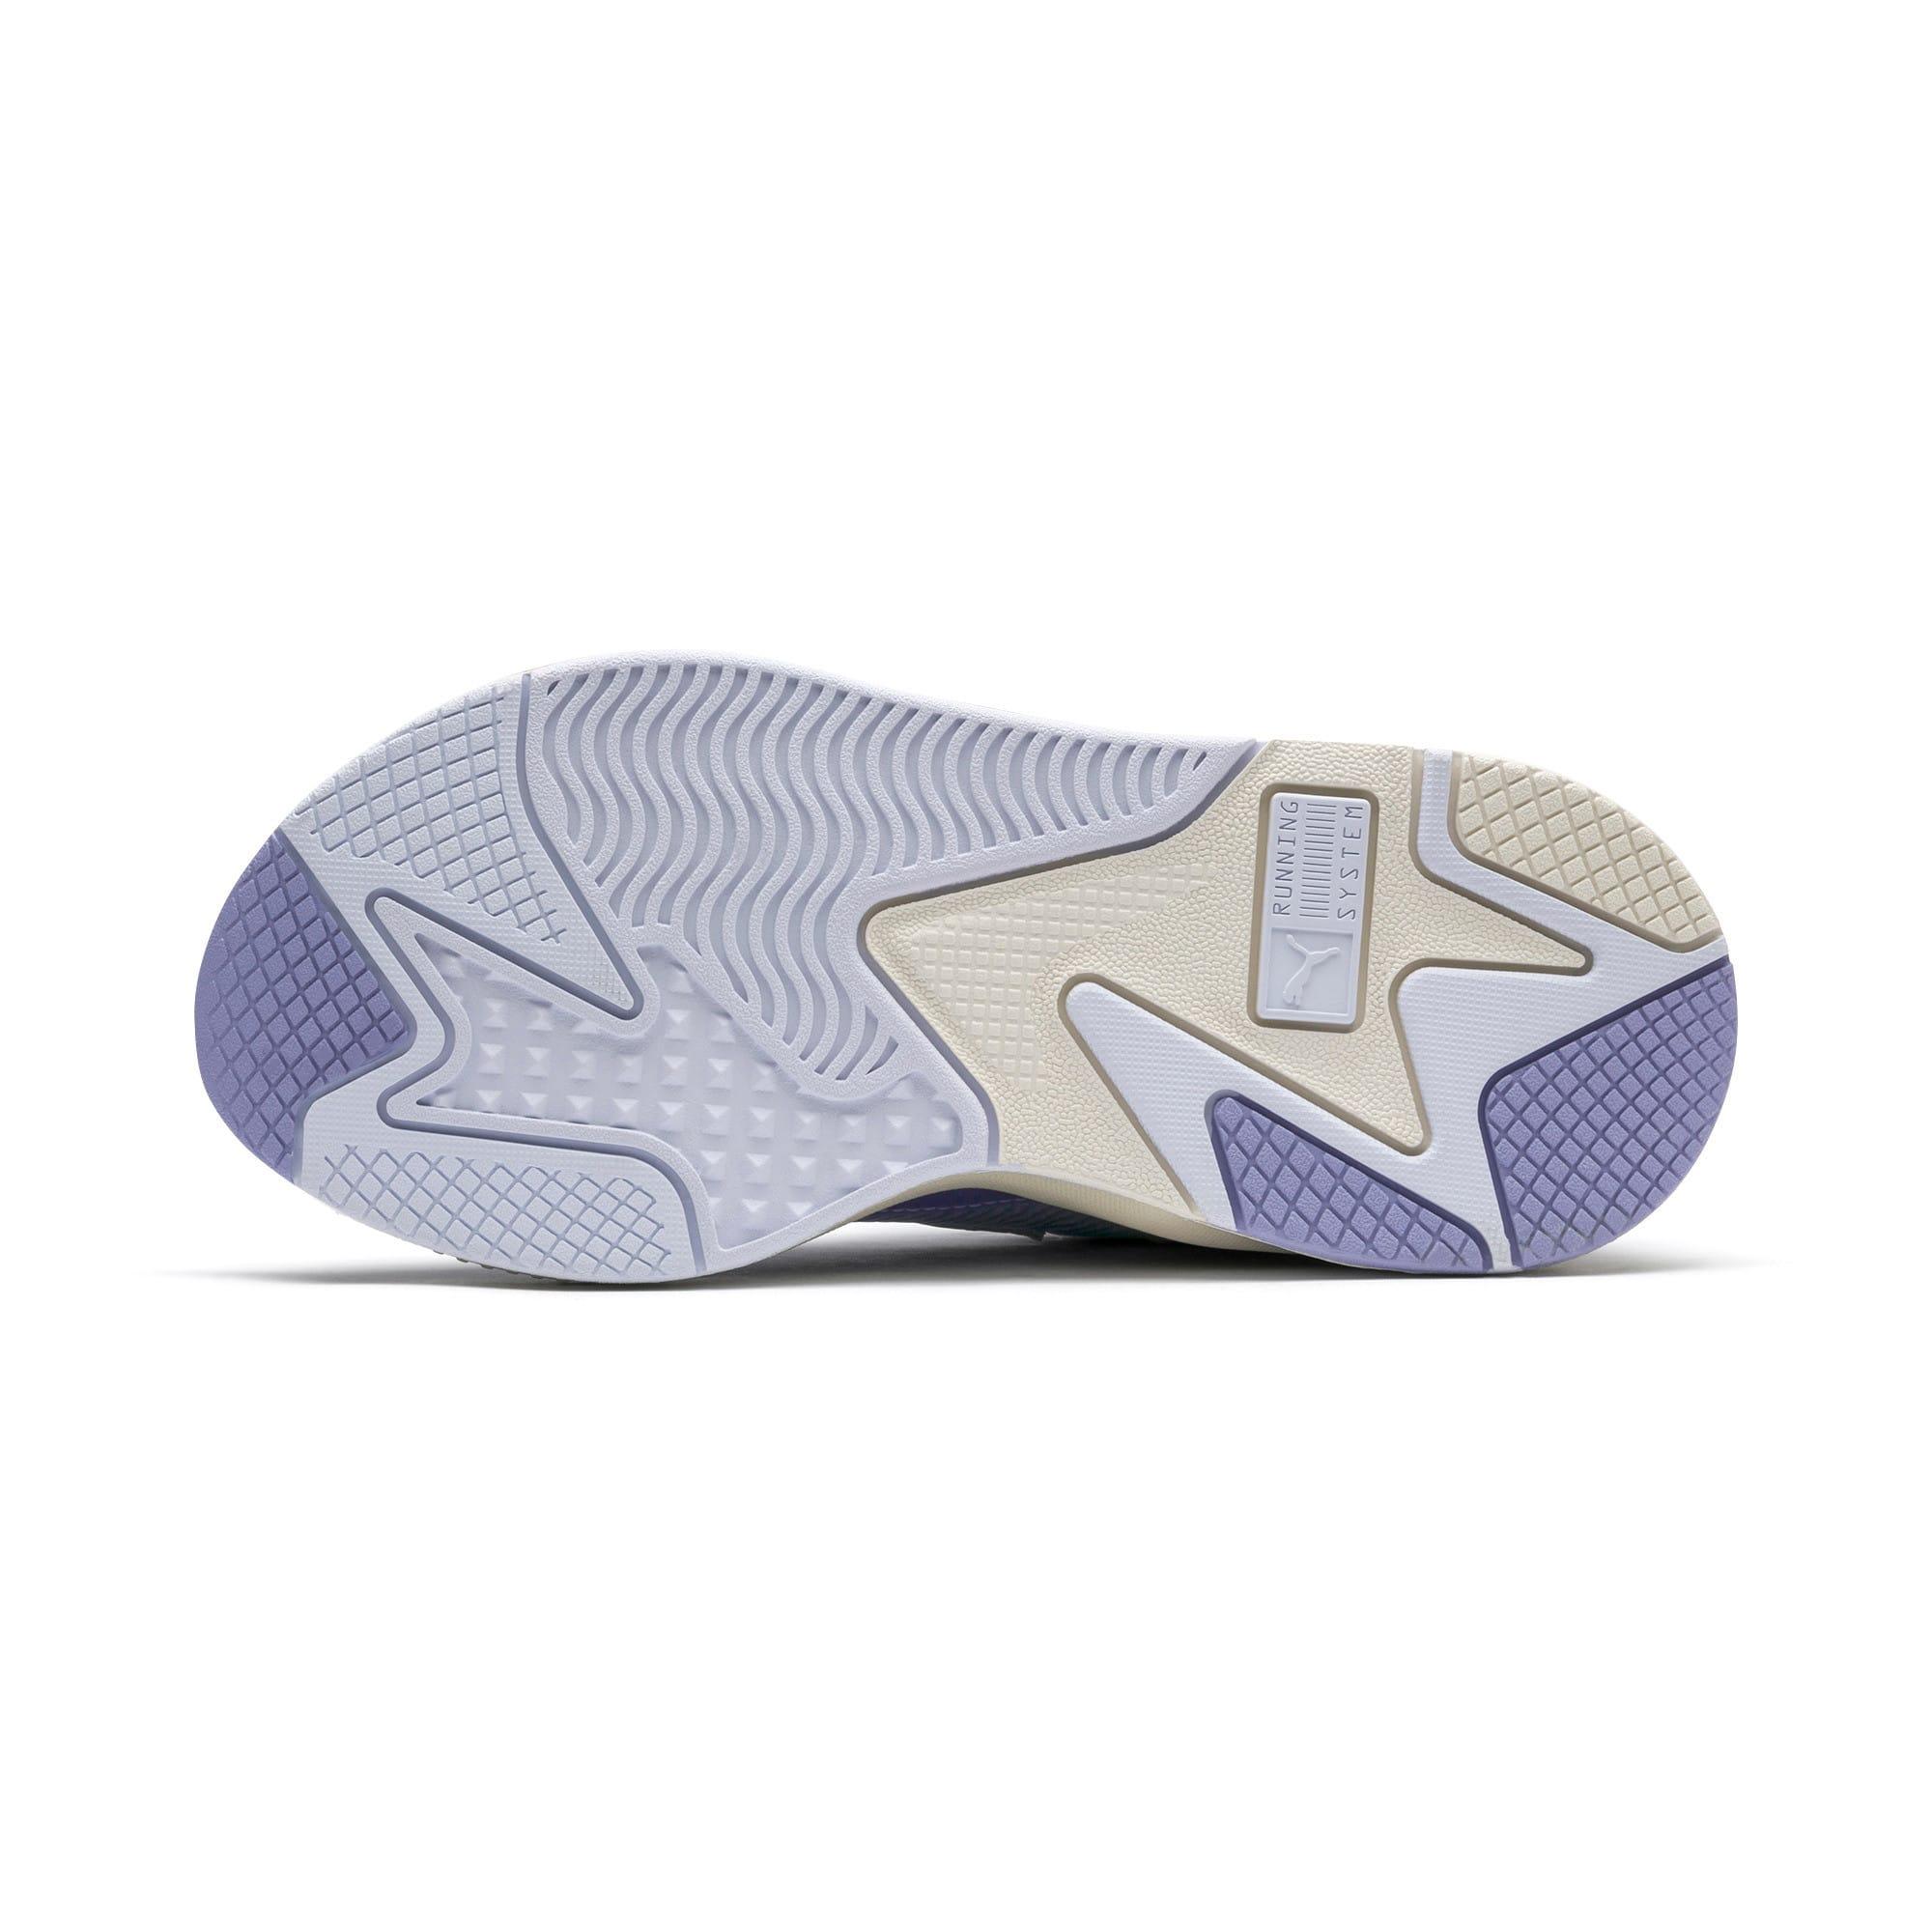 Thumbnail 4 of RS-X Tech Sneaker, Puma White-Sweet Lavender, medium